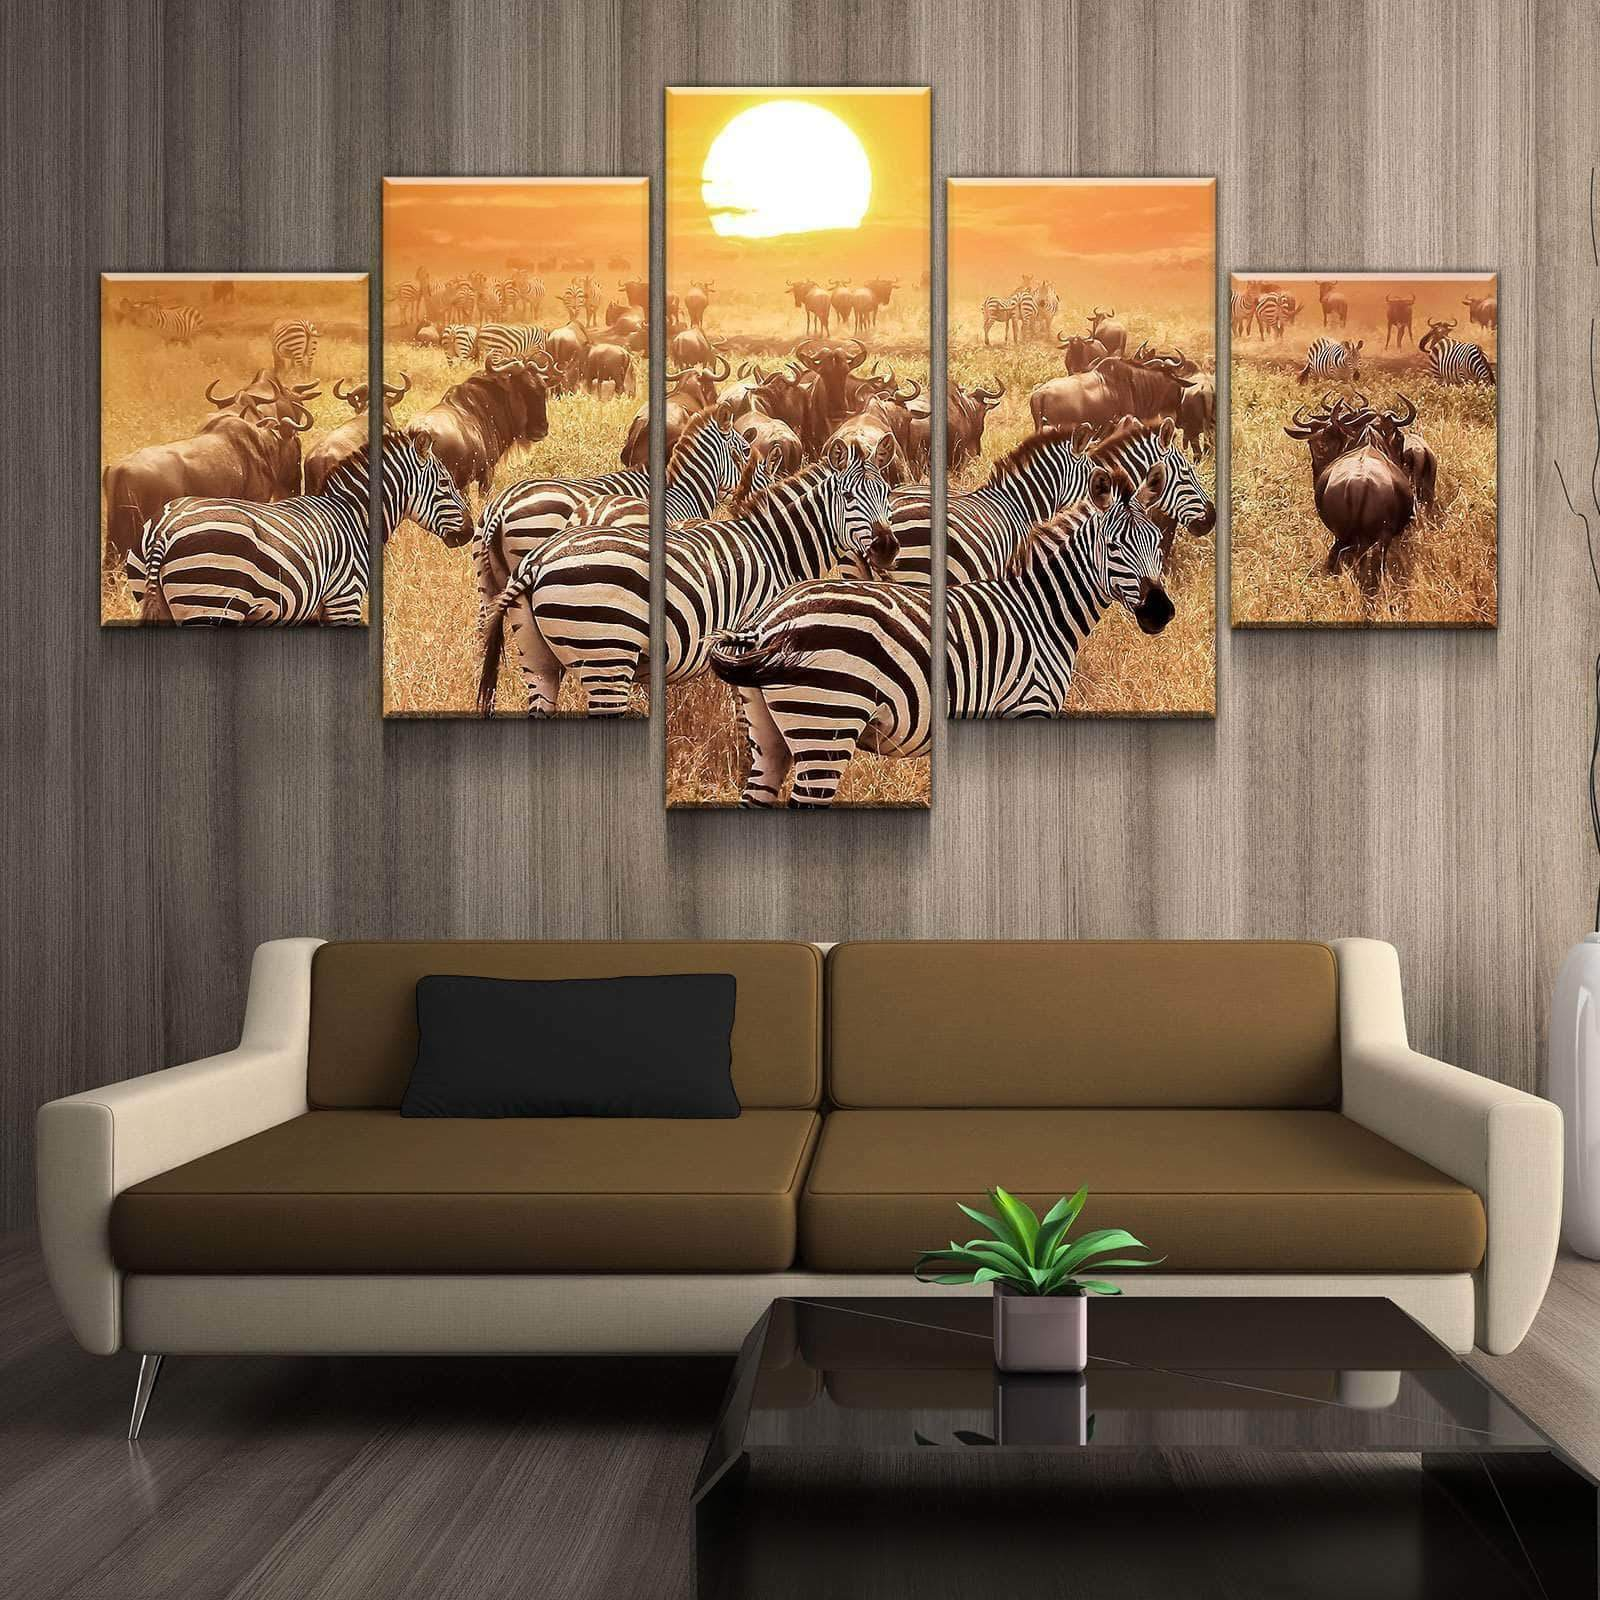 Zebra Sunset Buffalo 5 panel canvas Wall Art Home Decor Poster Print